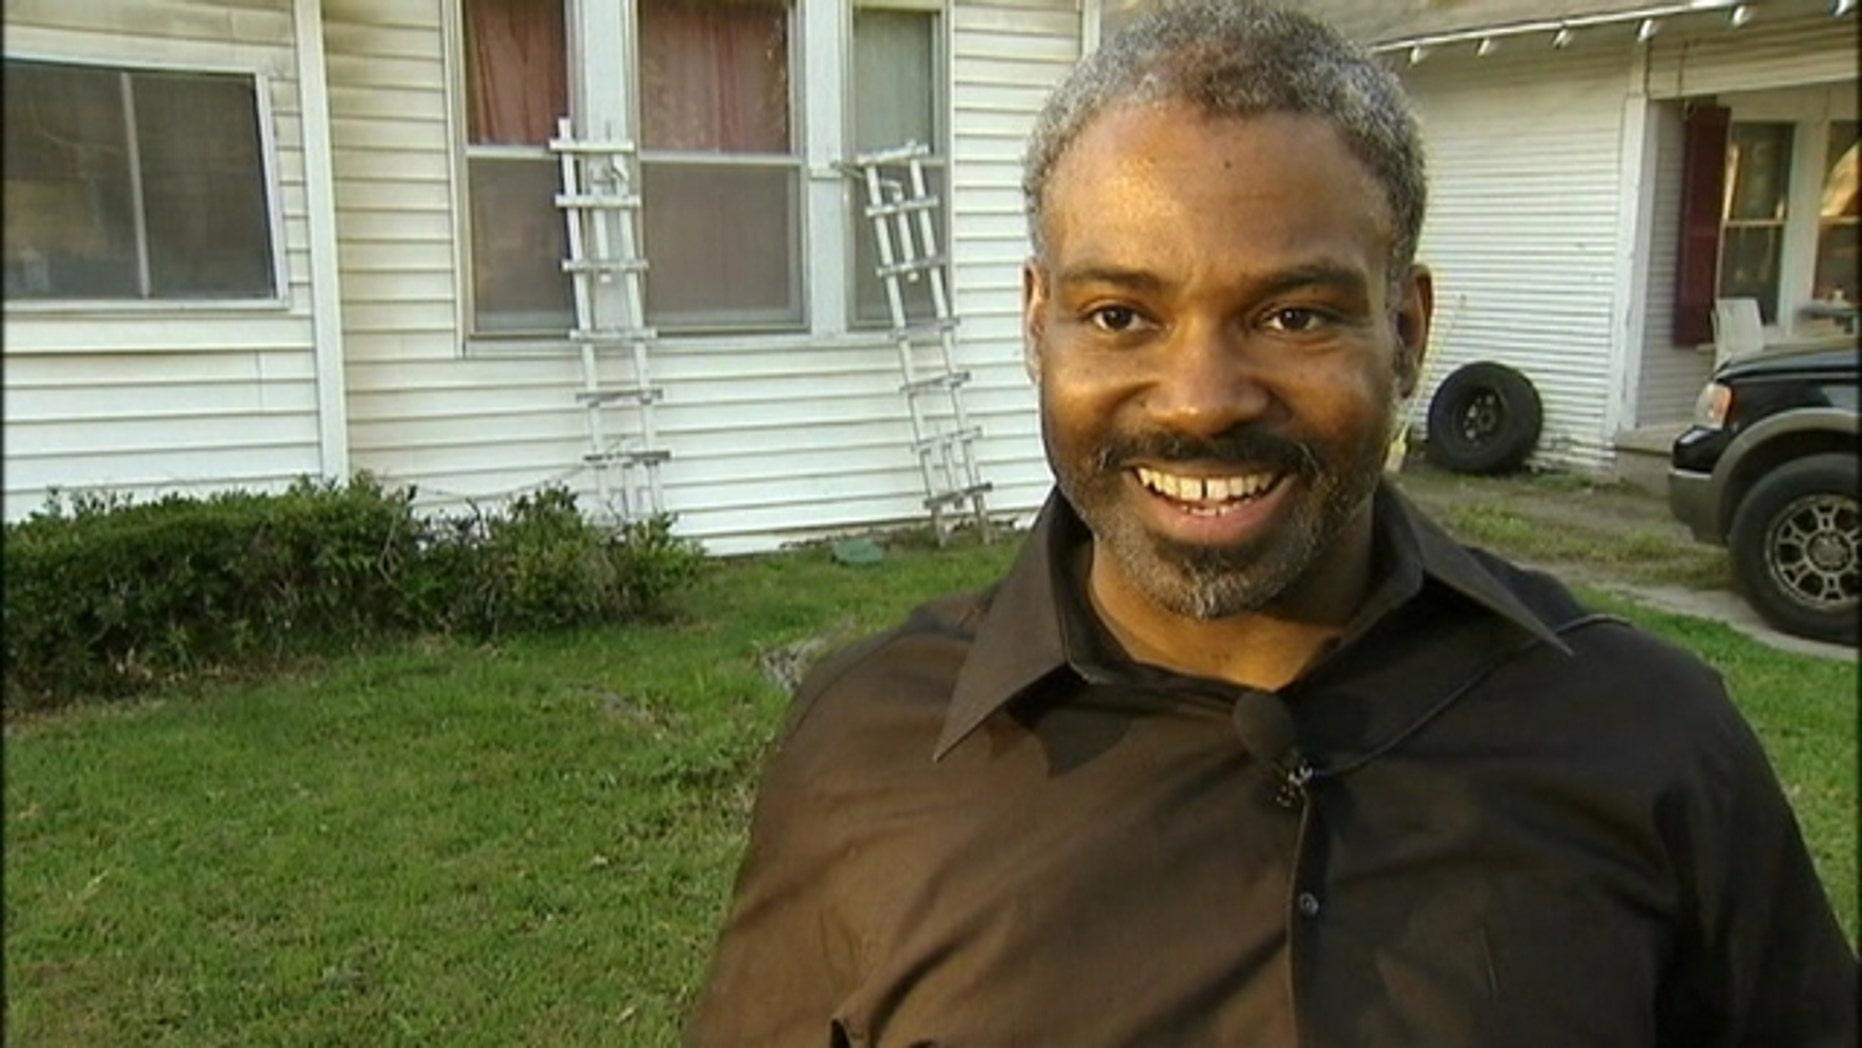 Walmart greeter Marcus Polk, 43.